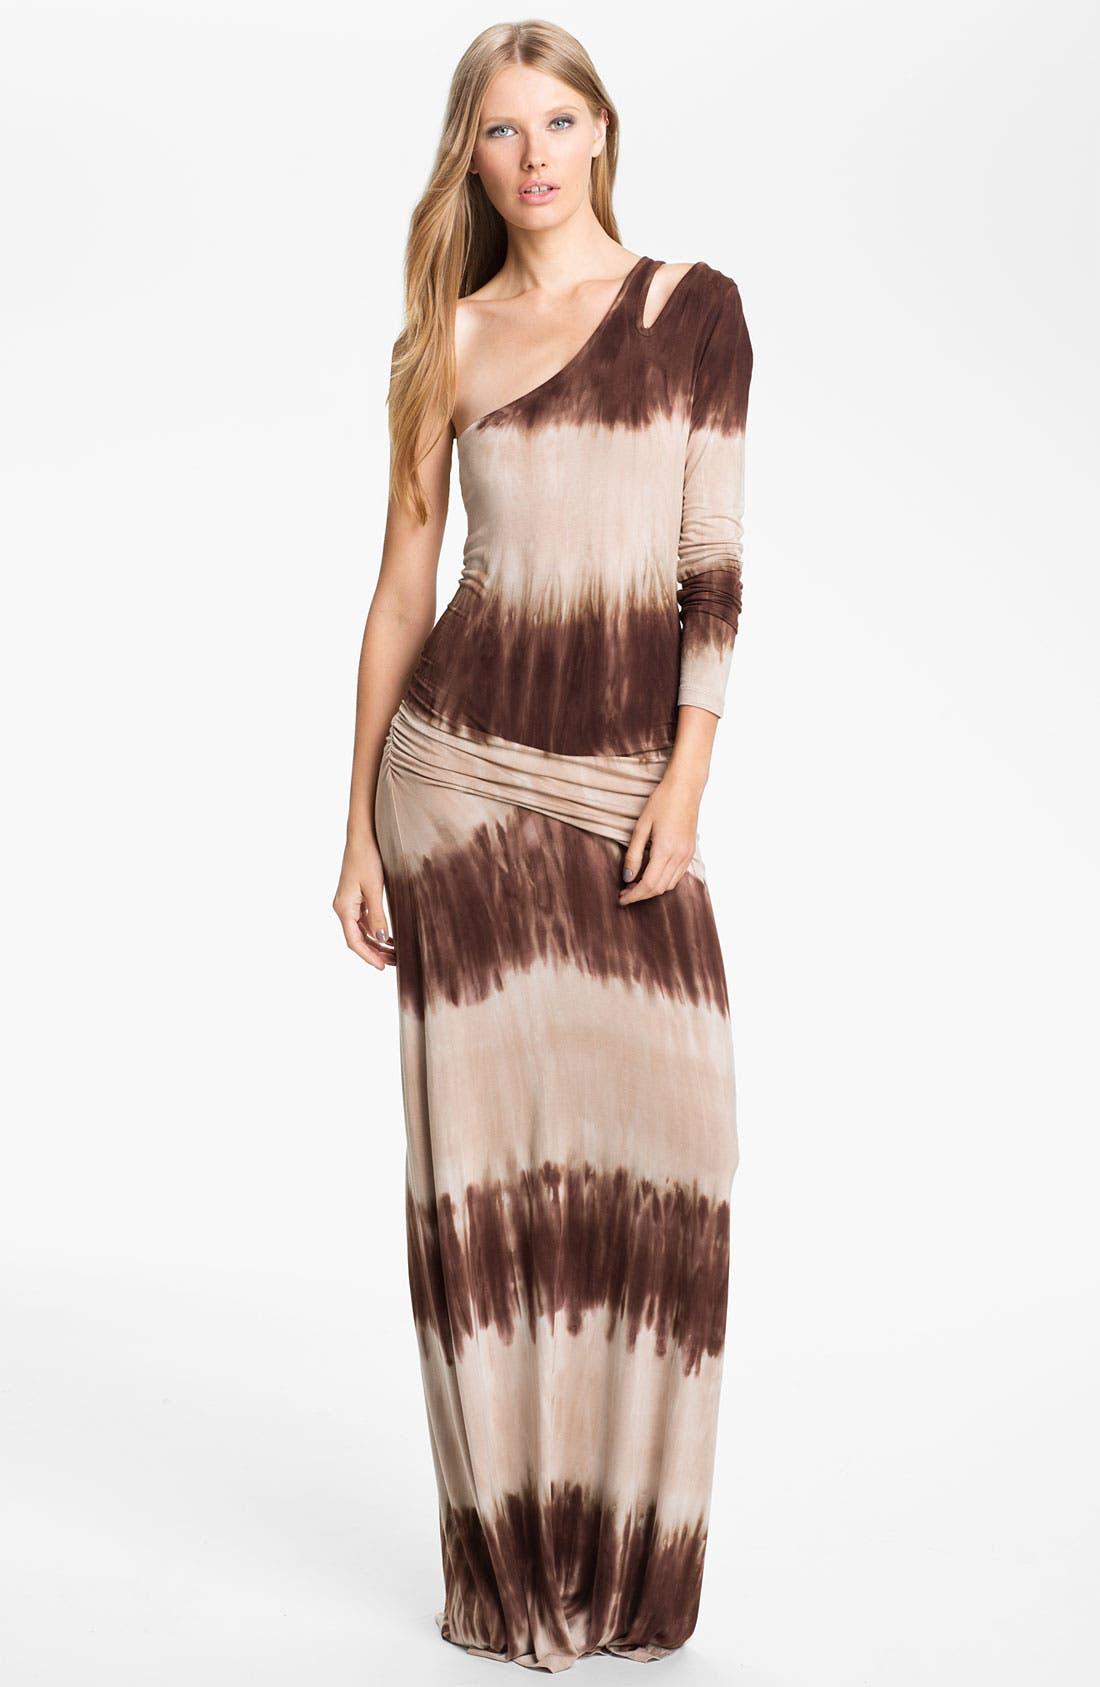 Alternate Image 1 Selected - Young, Fabulous & Broke 'Vinny' One Shoulder Maxi Dress